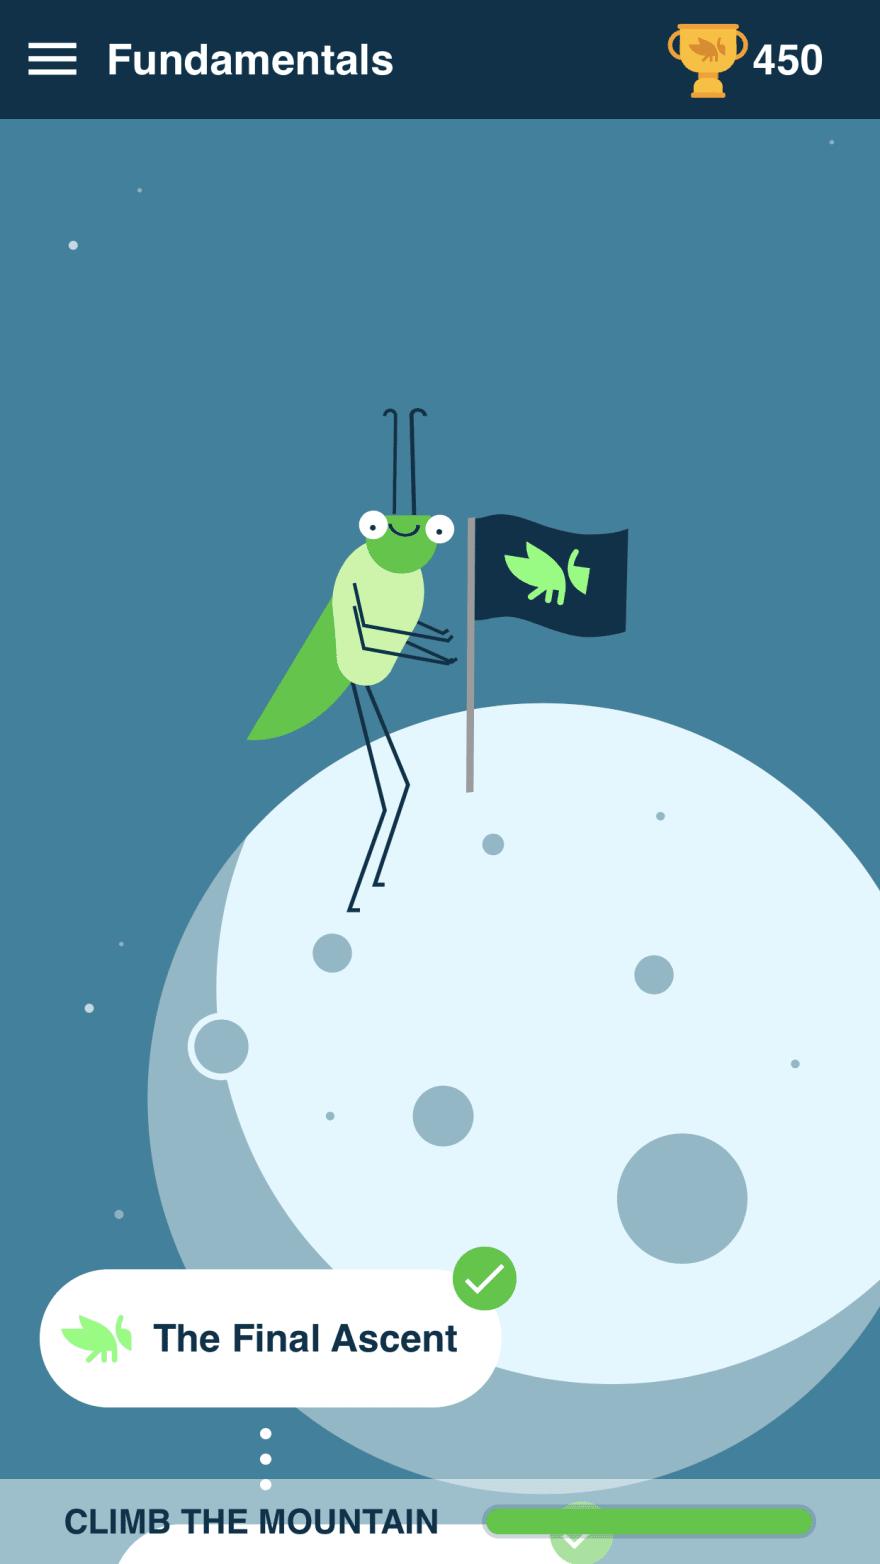 Screenshot from Grasshopper of the mascot Grace the Grasshopper